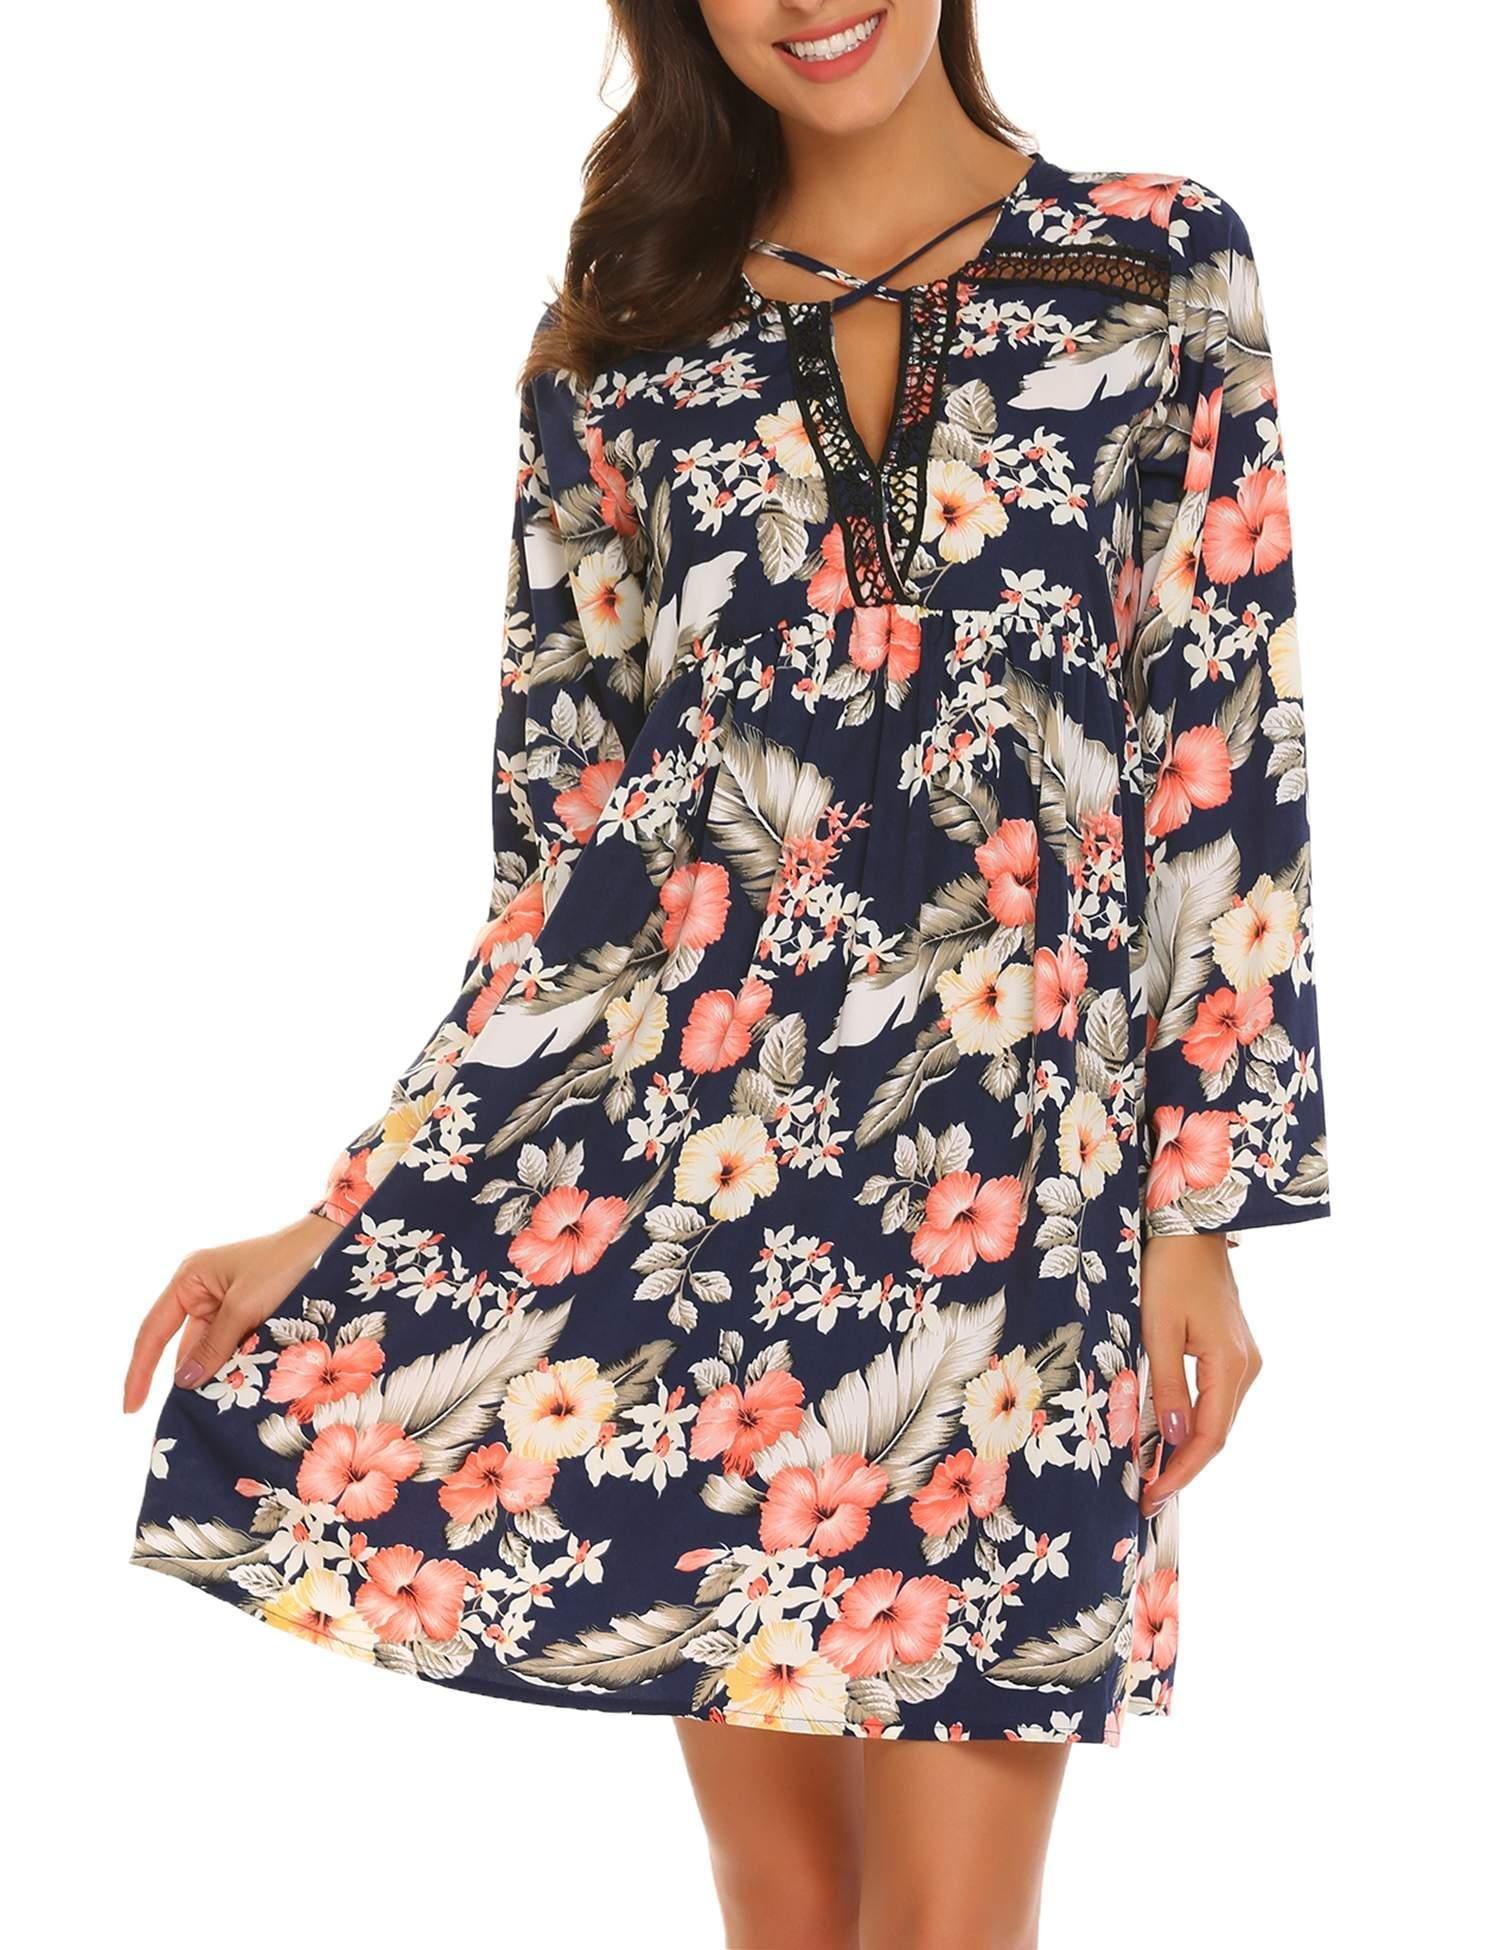 Beyove Women\'s Long Sleeve Fit and Flare Bohemian Vintage Printed Loose Casual Dress